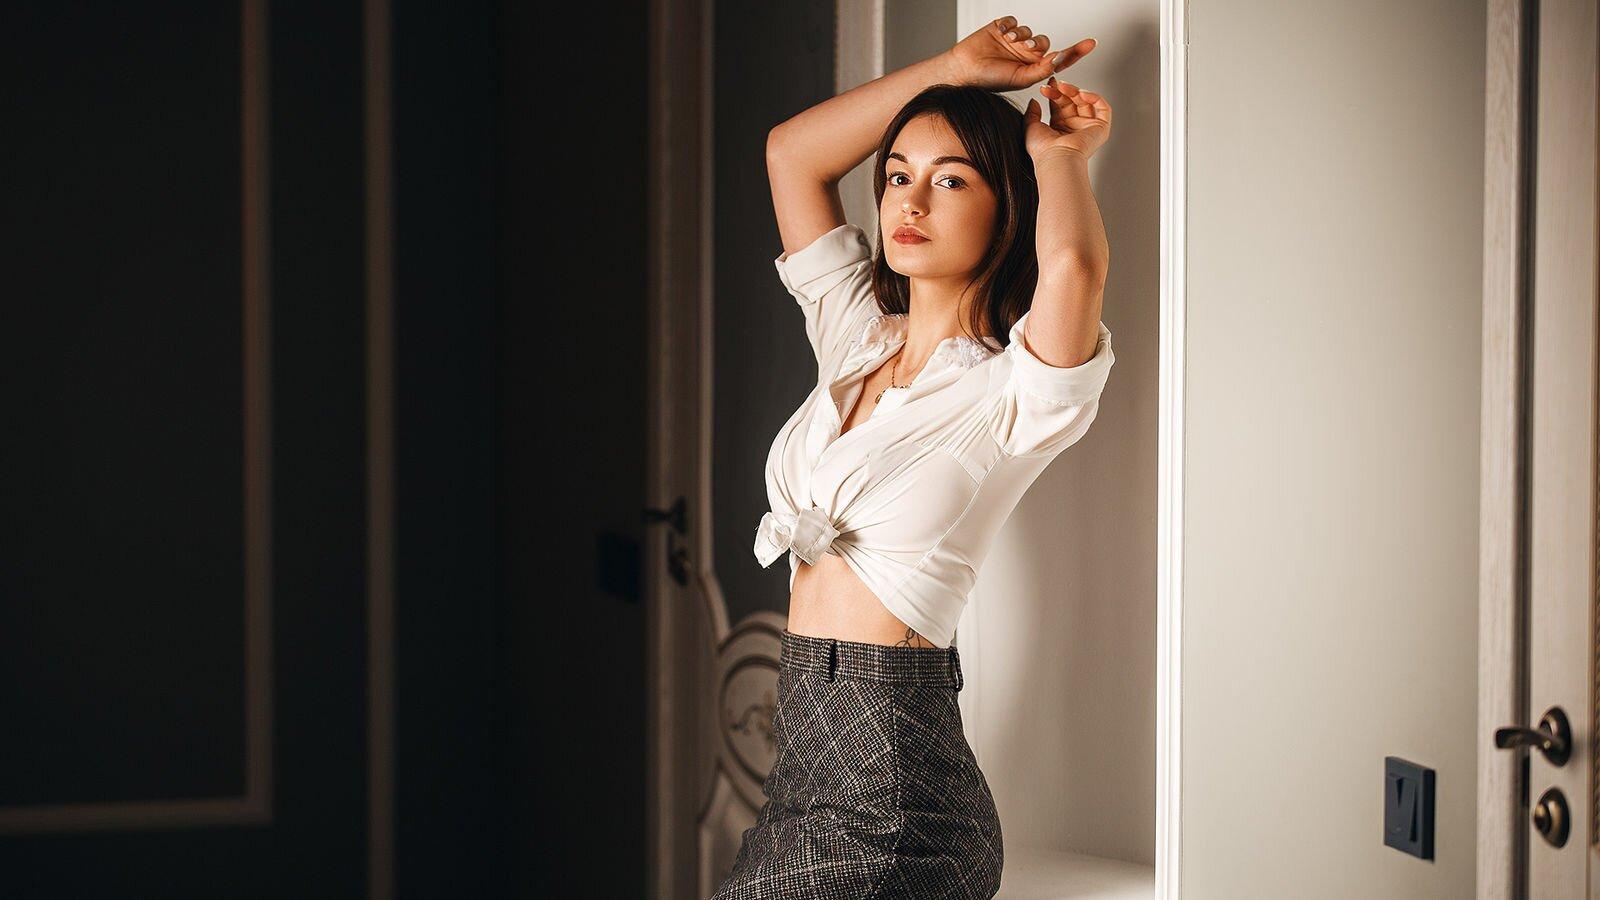 ScarlettLovinson